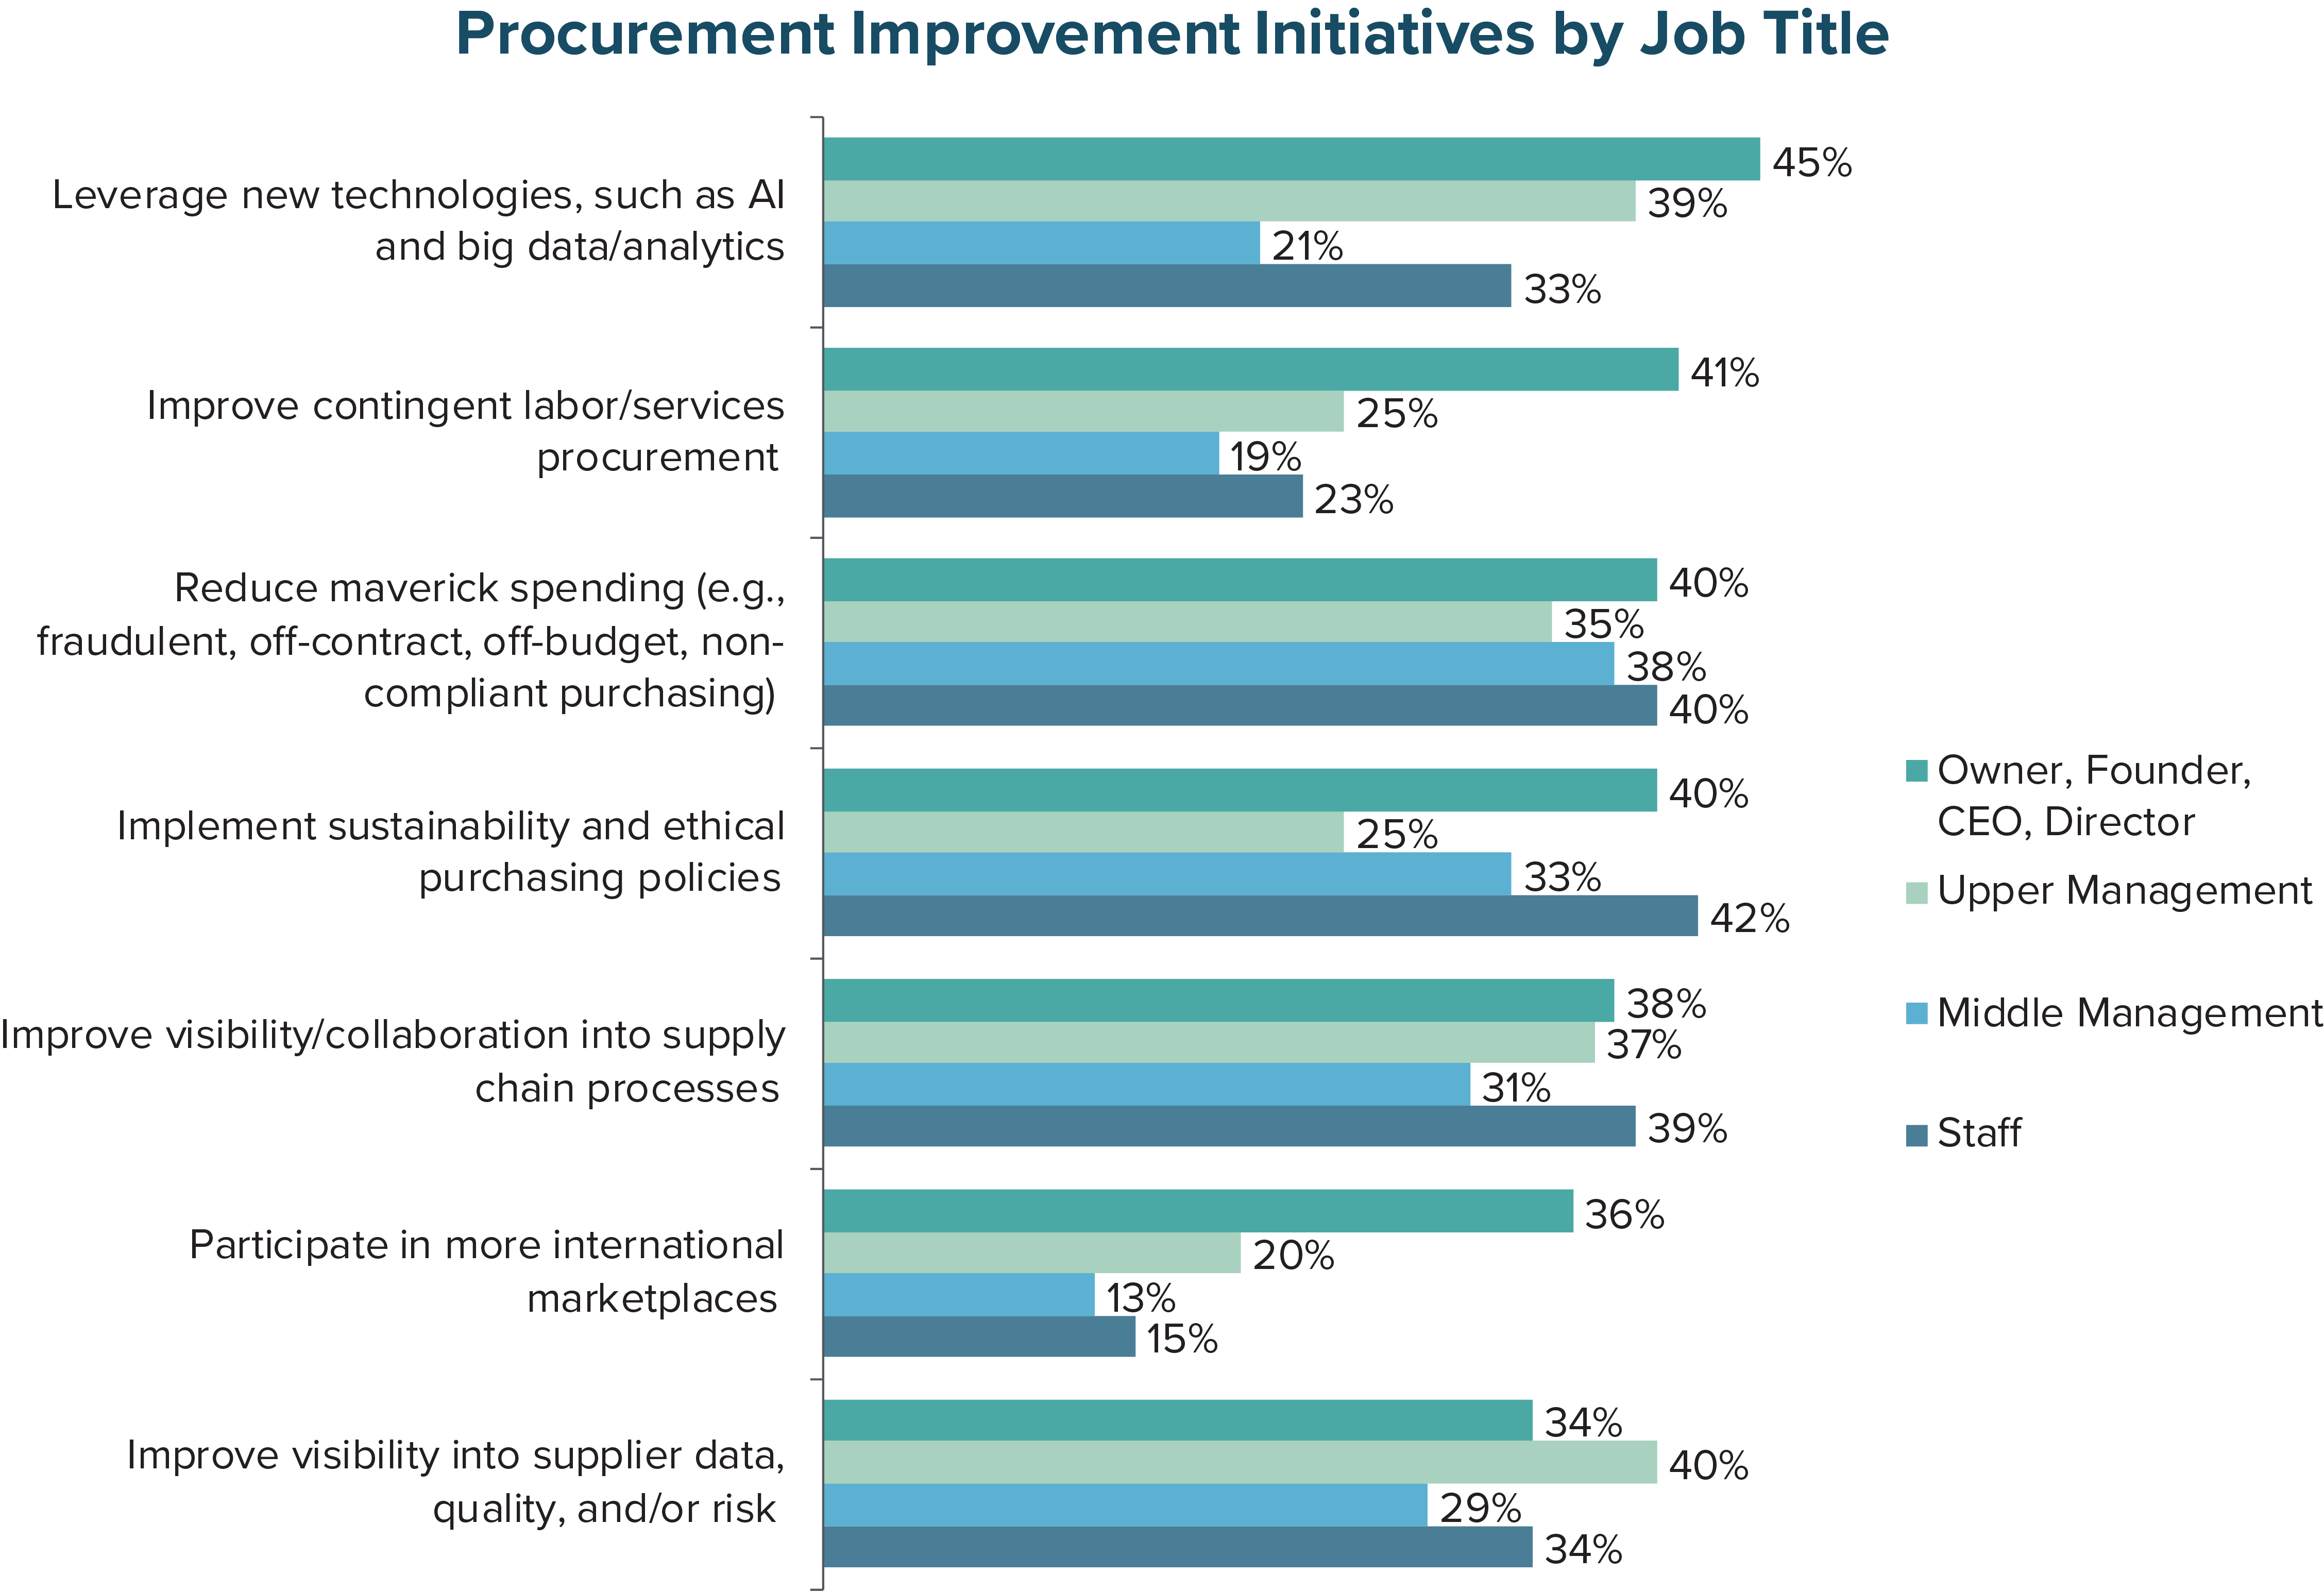 Procurement Improvement Iniatives by Job Title